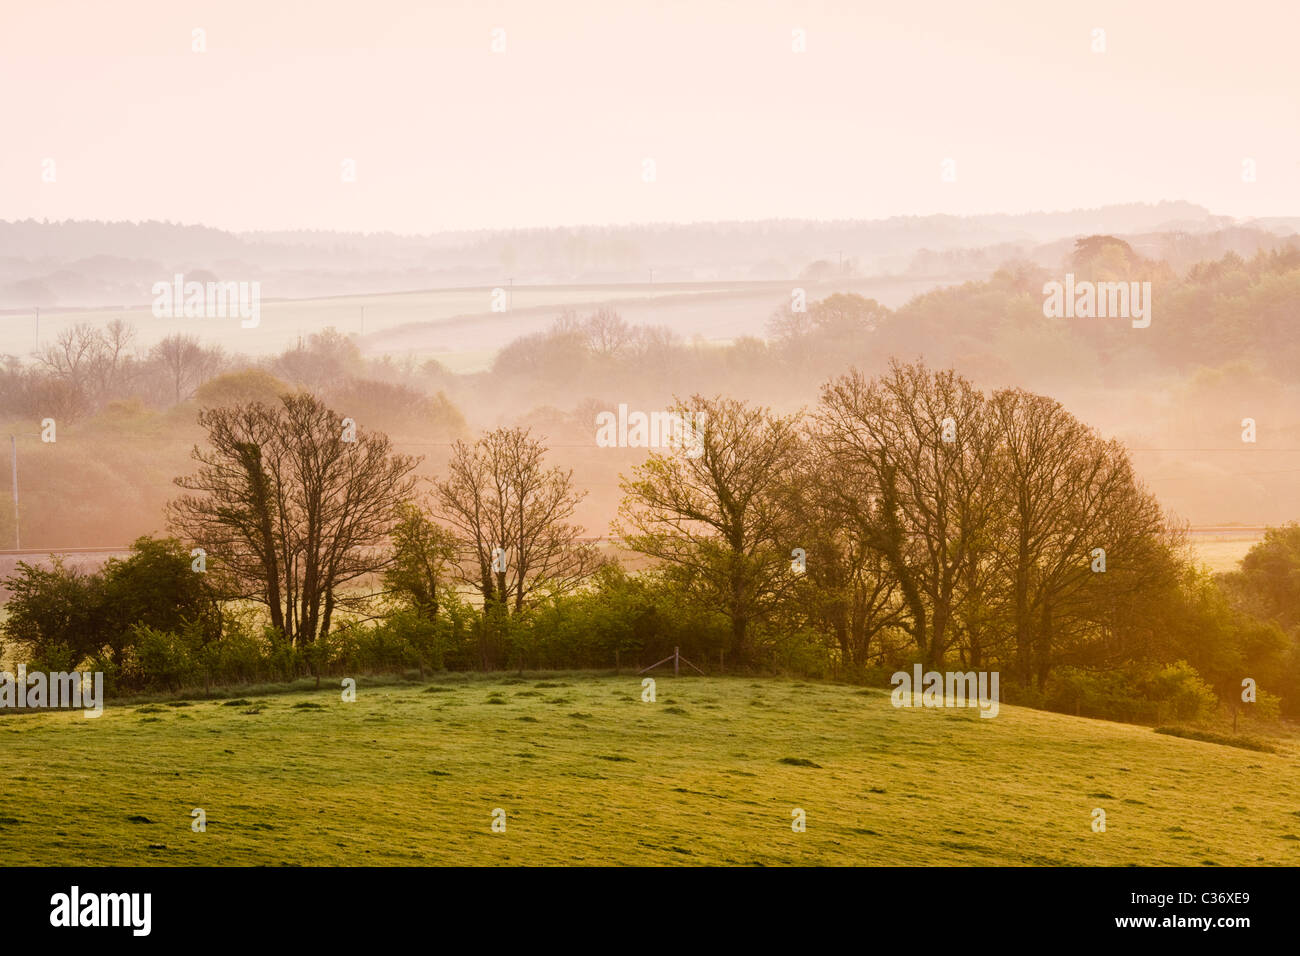 Misty dawn in early spring near Corfe Castle village, Dorset, UK Stock Photo